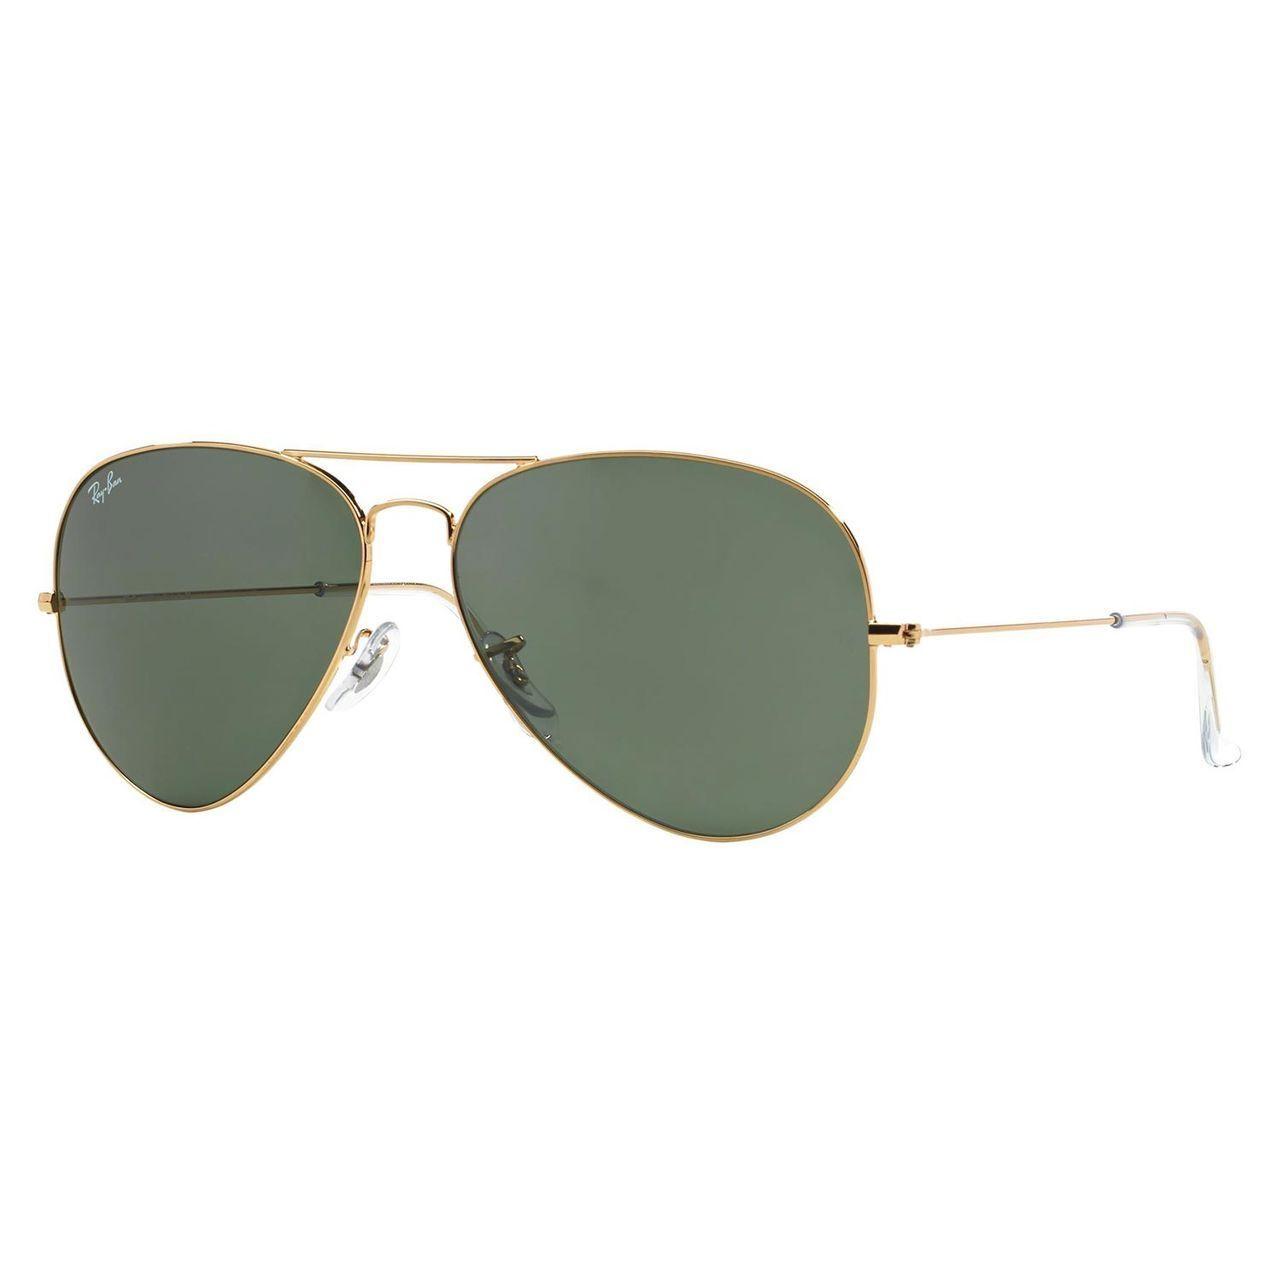 46a9a308e7e Shop Ray-Ban RB3026 Aviator Sunglasses - Gold - Free Shipping Today ...